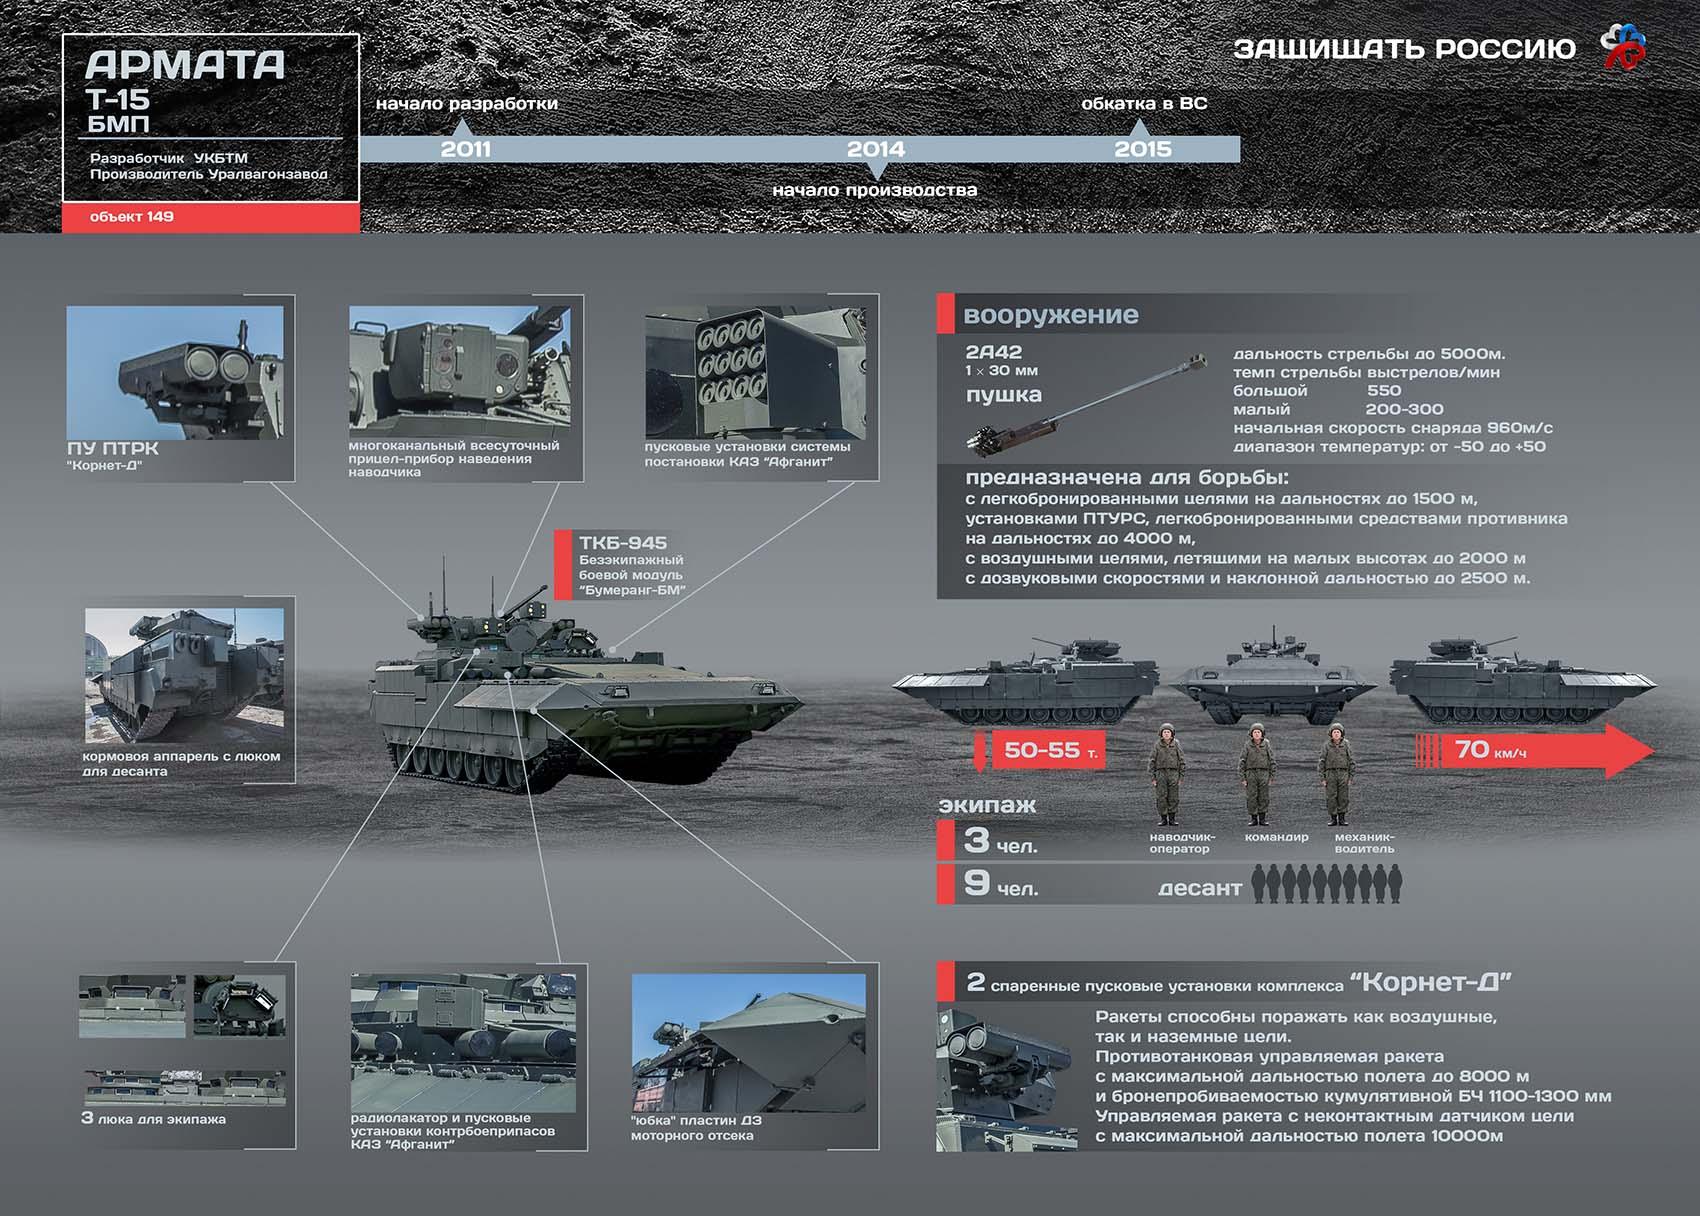 Инфографика особенности Т-15